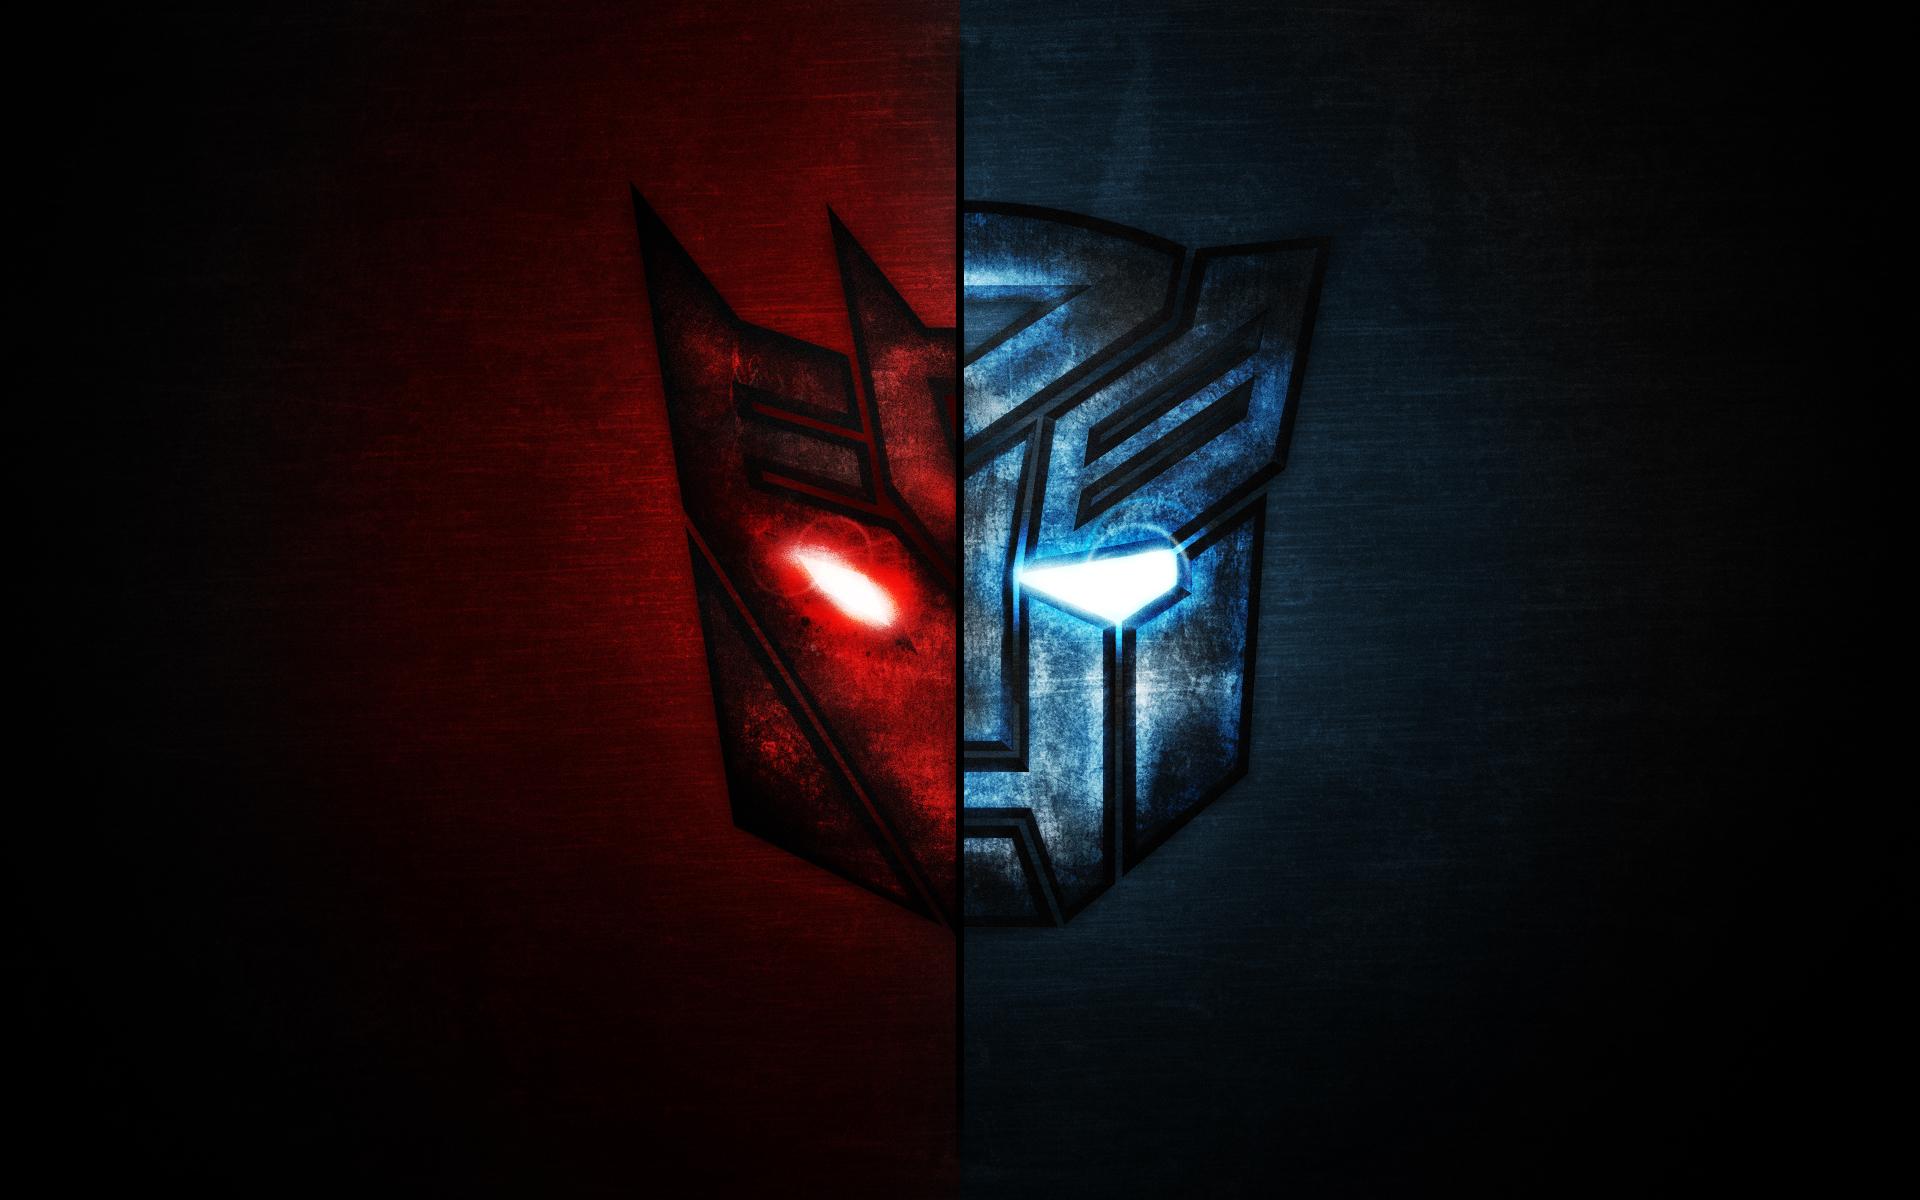 Transformers Logo Wallpapers   Full HD wallpaper search 1920x1200